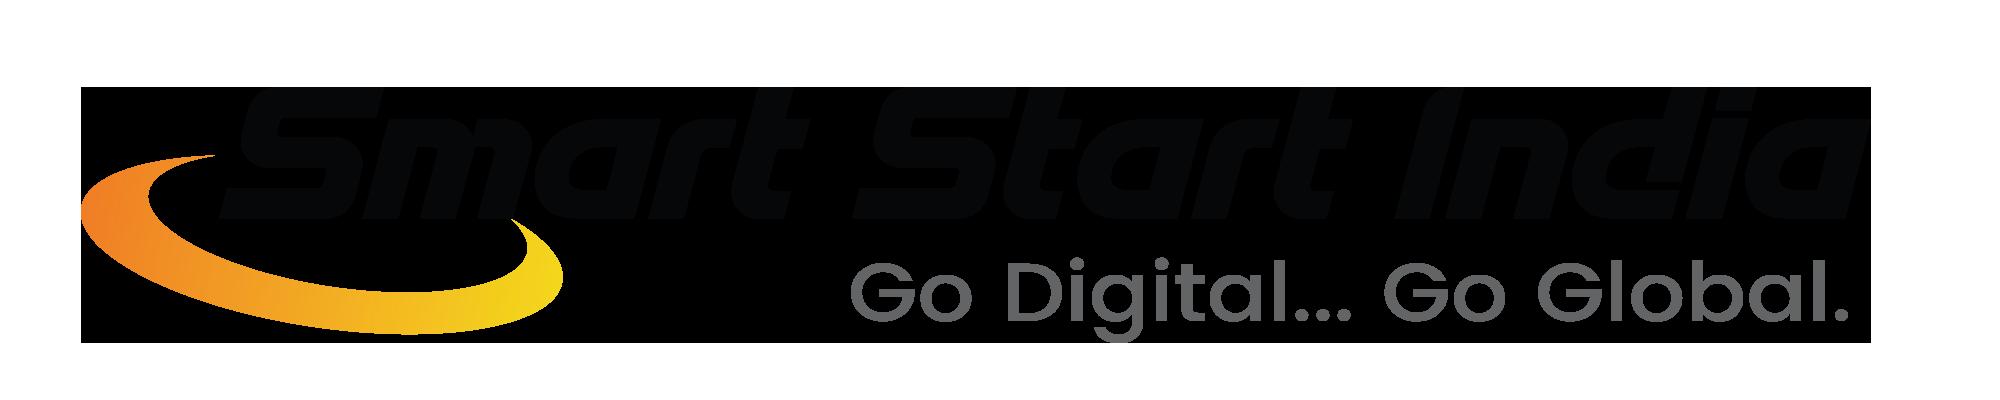 Smart Start India